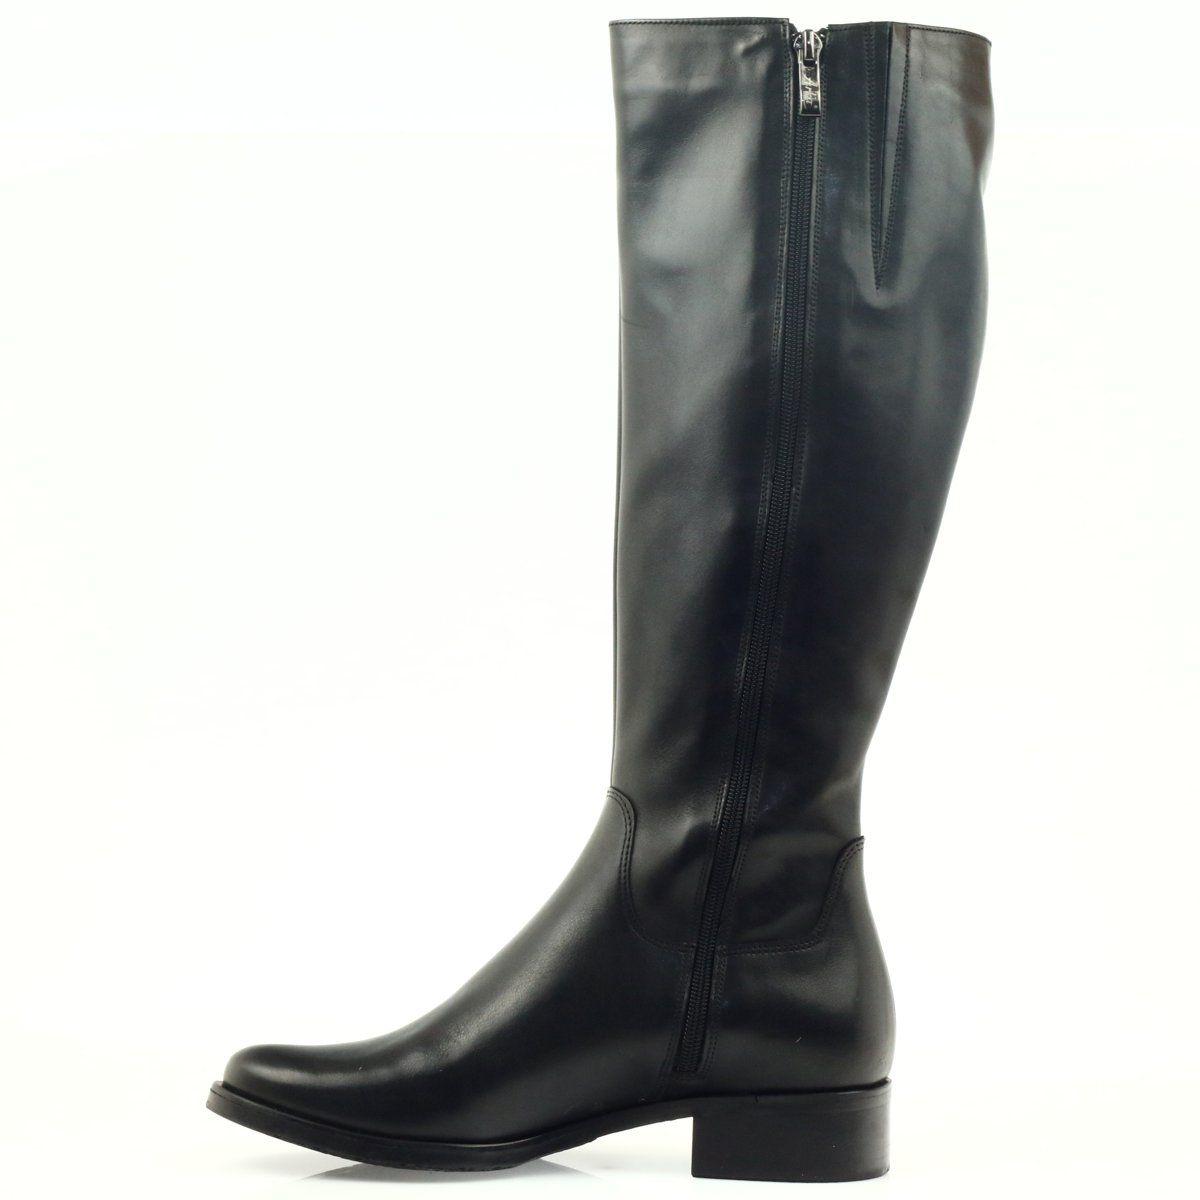 Kozaki Oficerki Czarne Arka 7217 Boots Black Boots Womens Boots